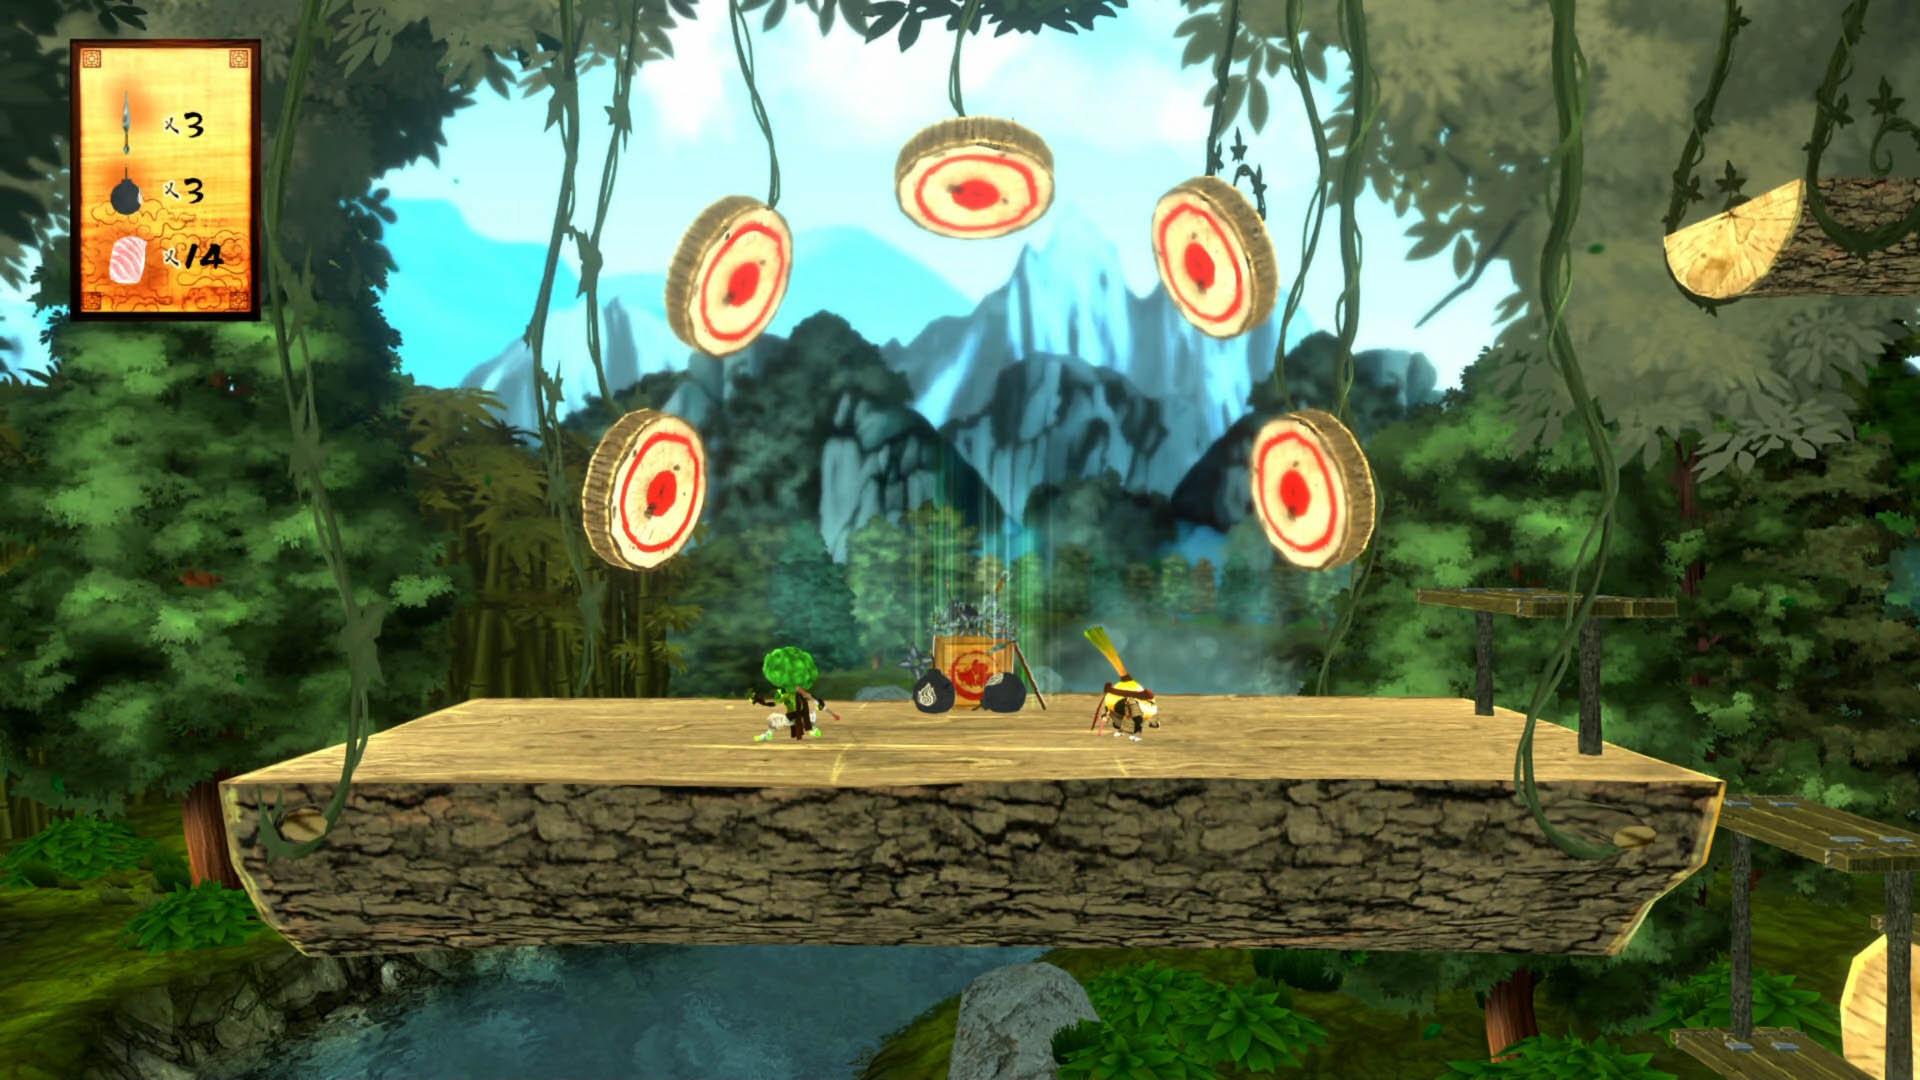 KYURINAGA'S REVENGE Game | PS4 - PlayStation